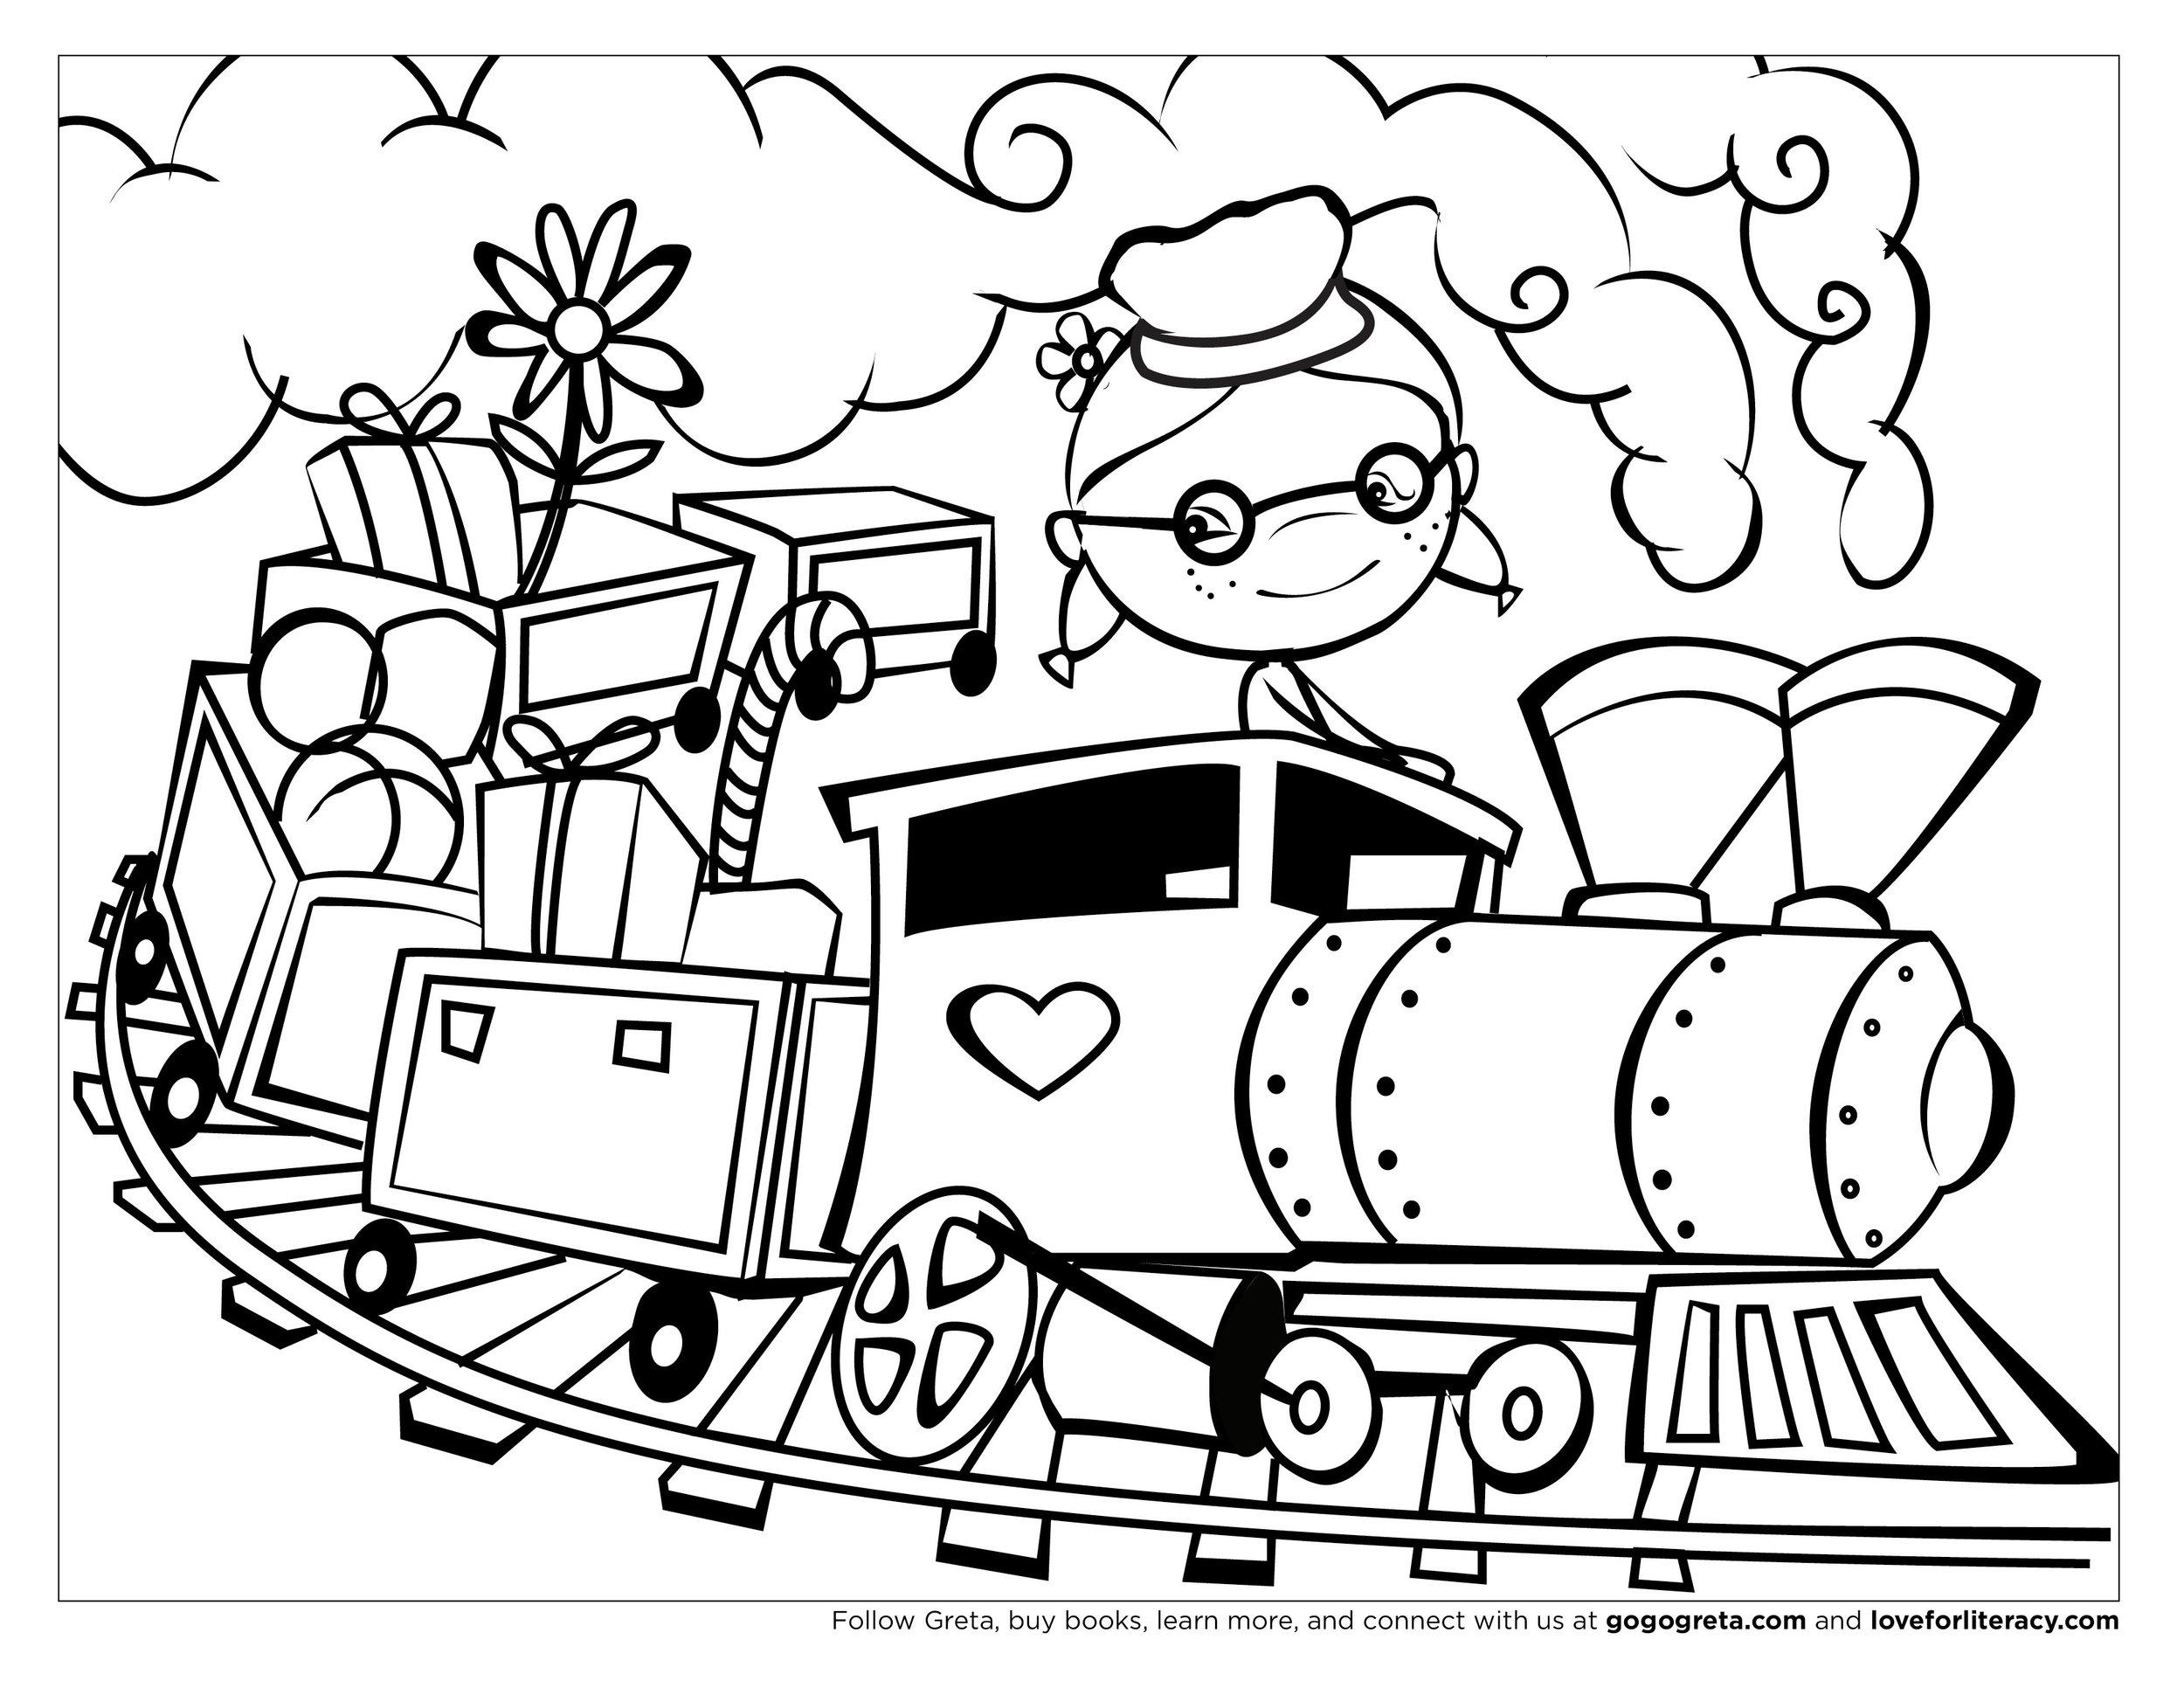 GoGoGreta_Coloring Pages_0406177.jpg